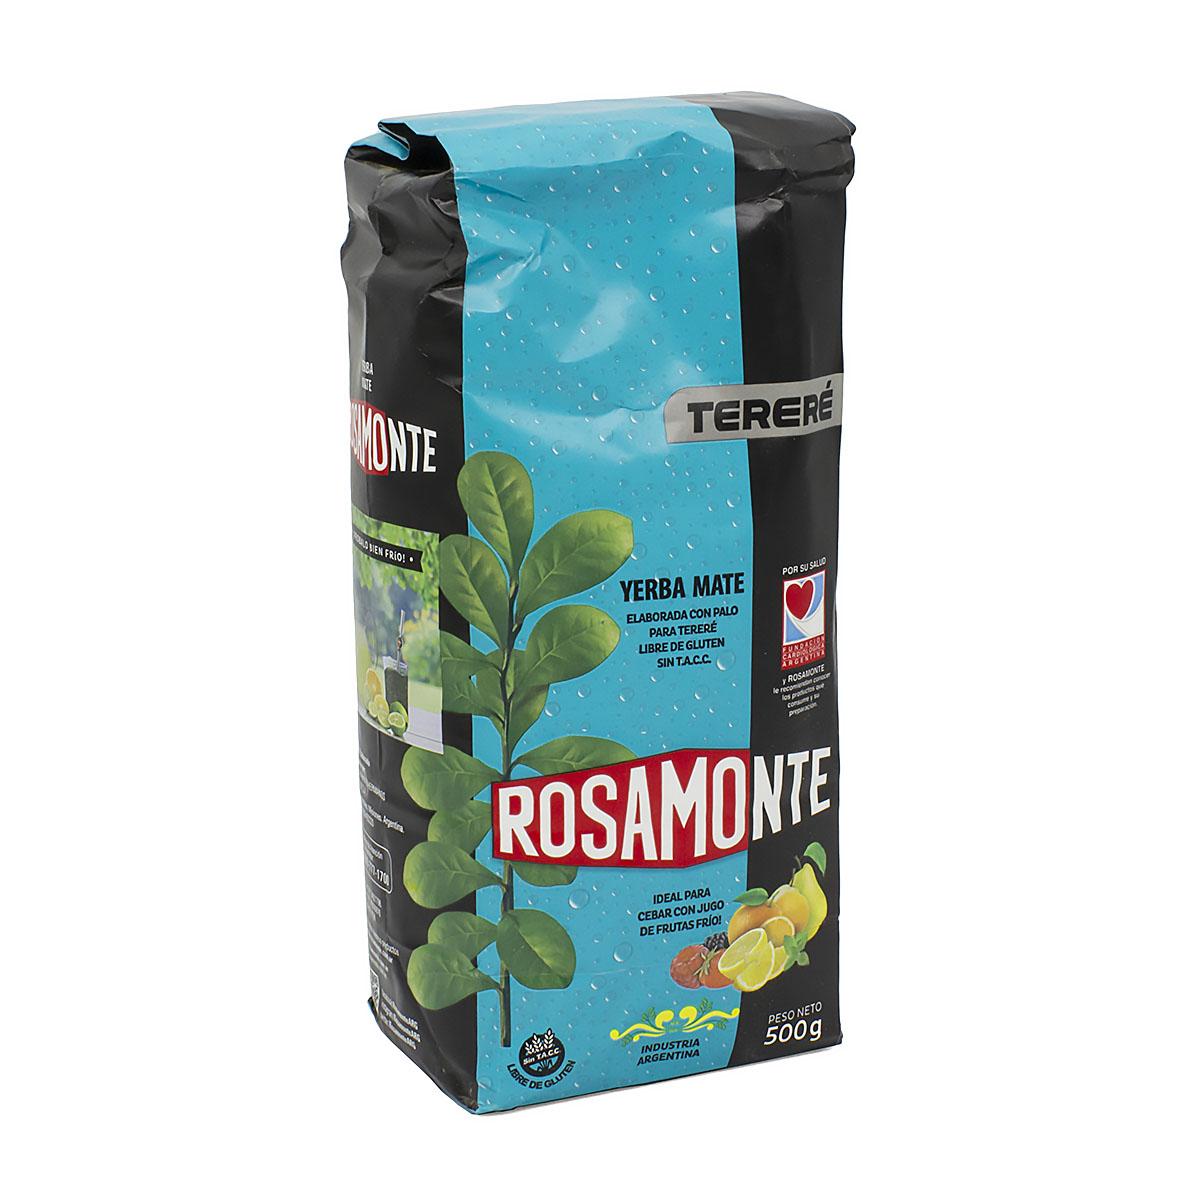 Мате Rosamonte Terere, 500 г мате rosamonte despalada 500 г